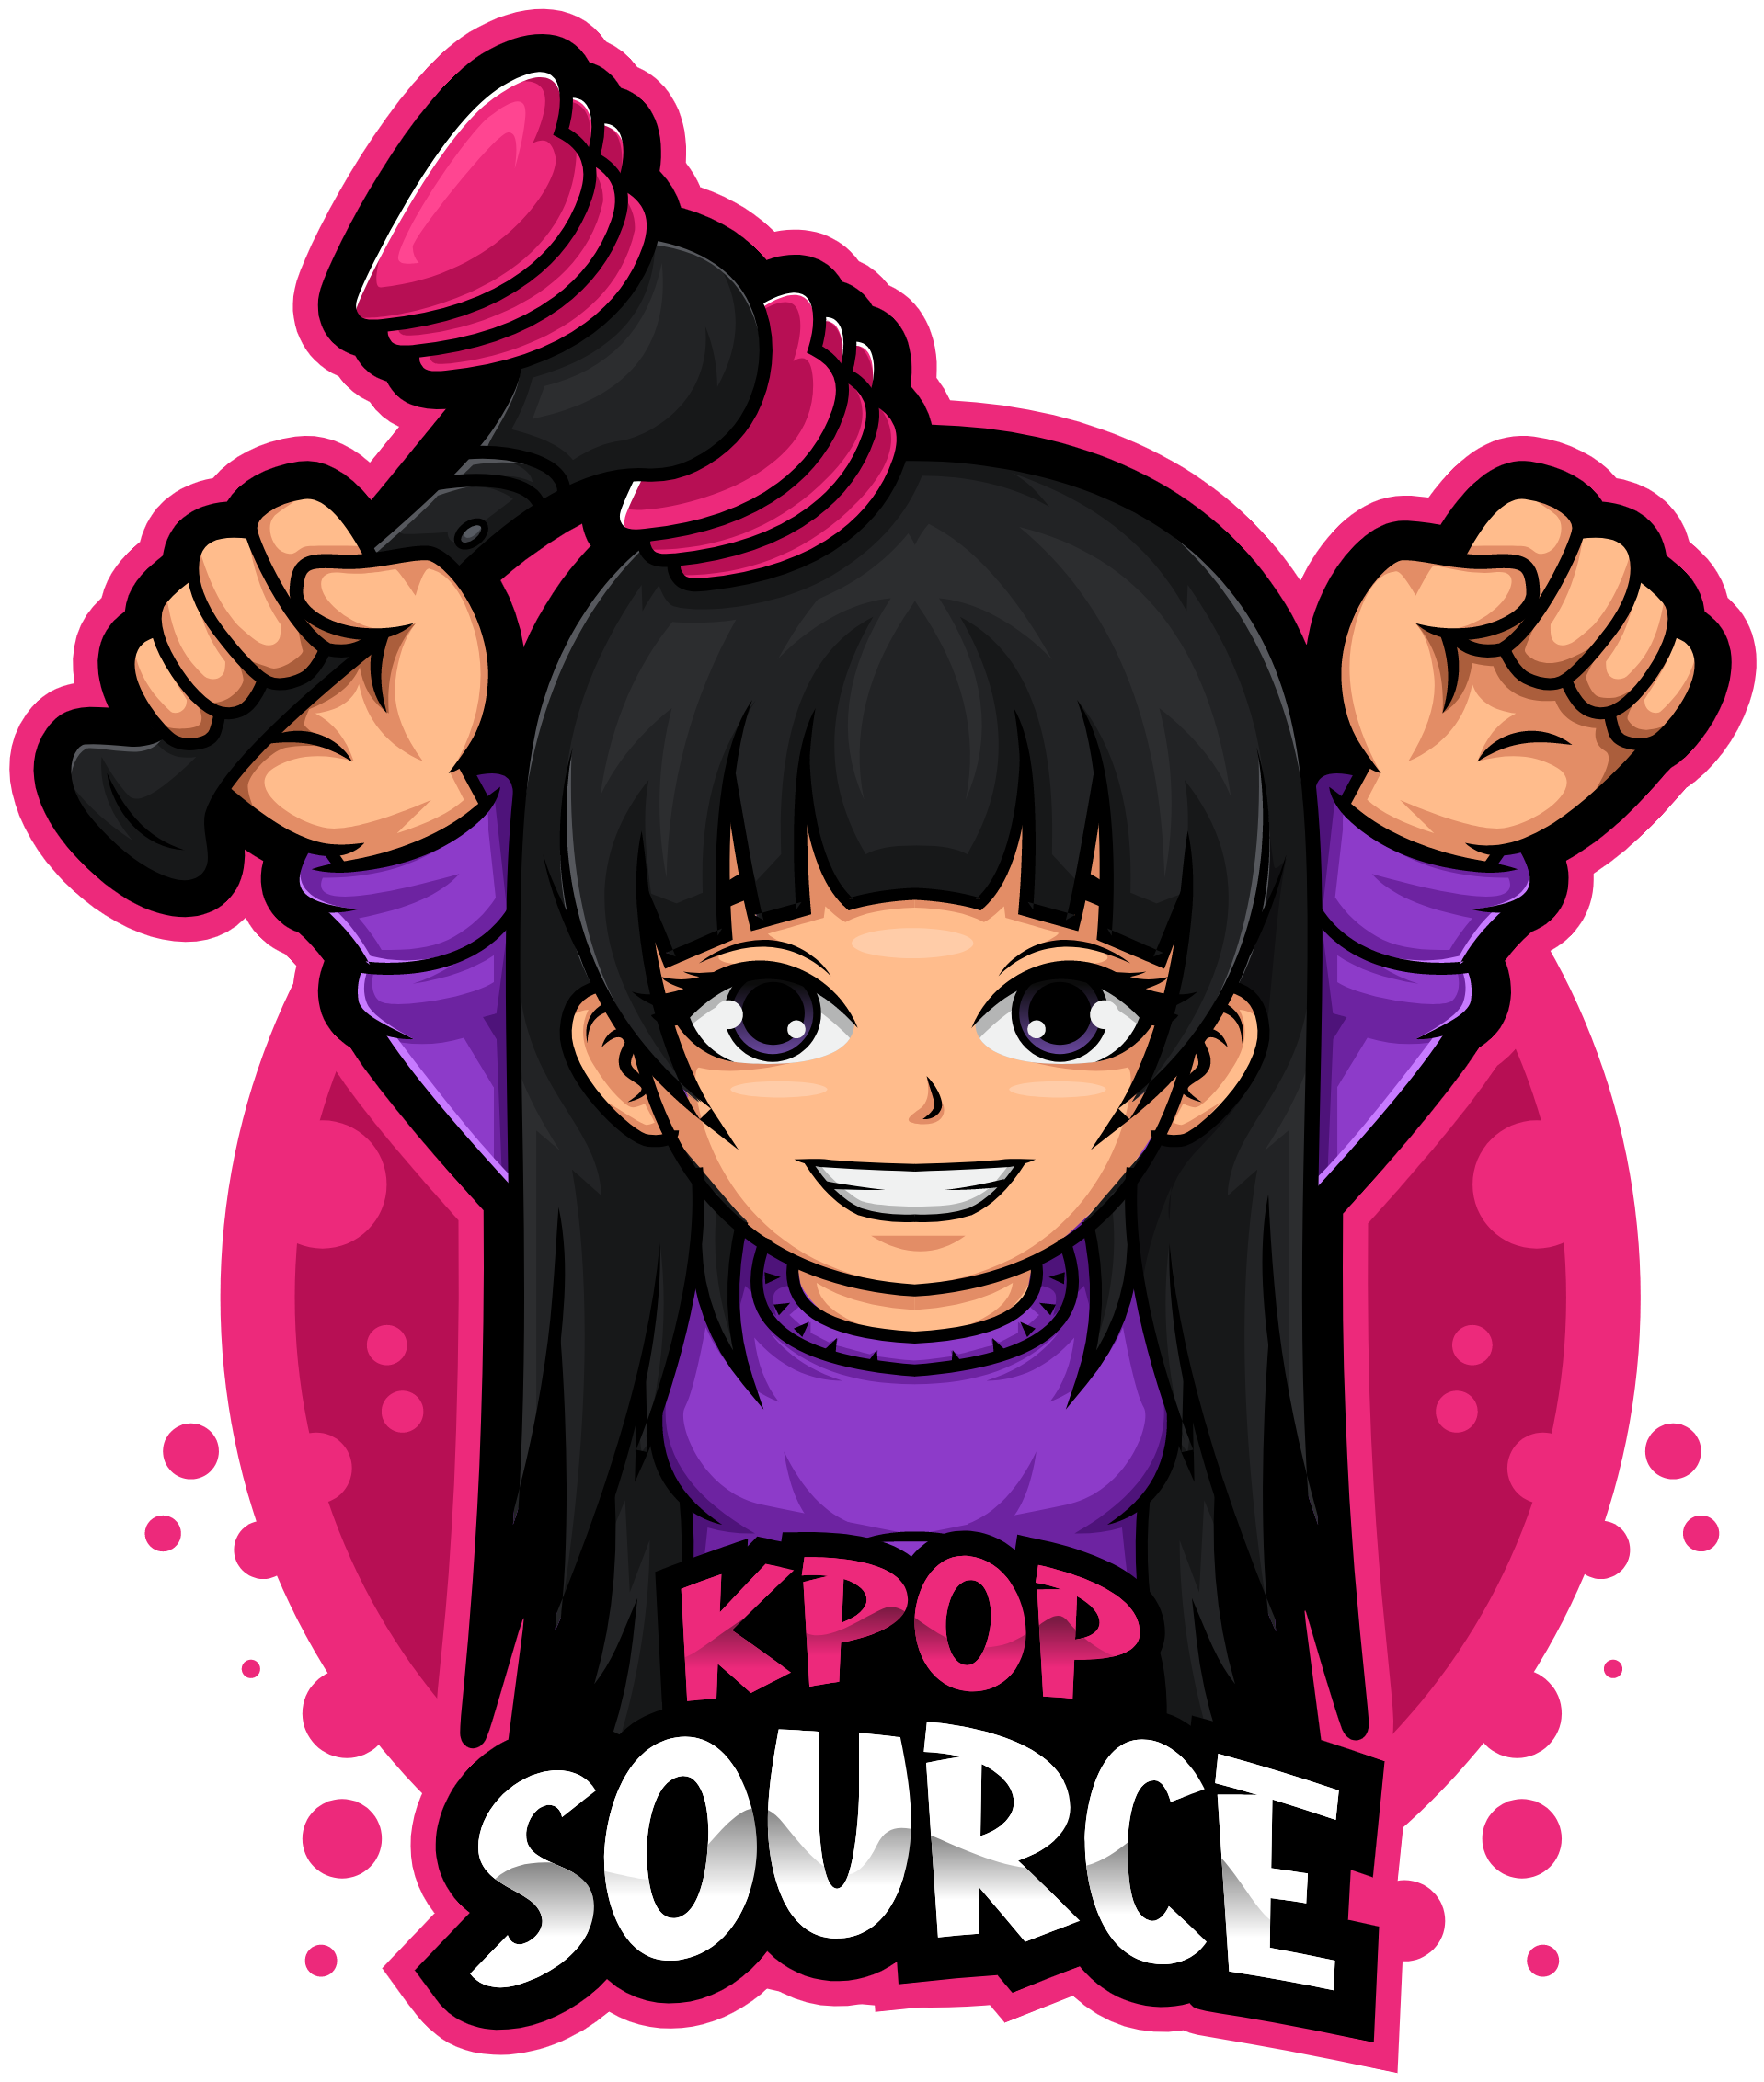 Kpopsource - International kpop forum community.